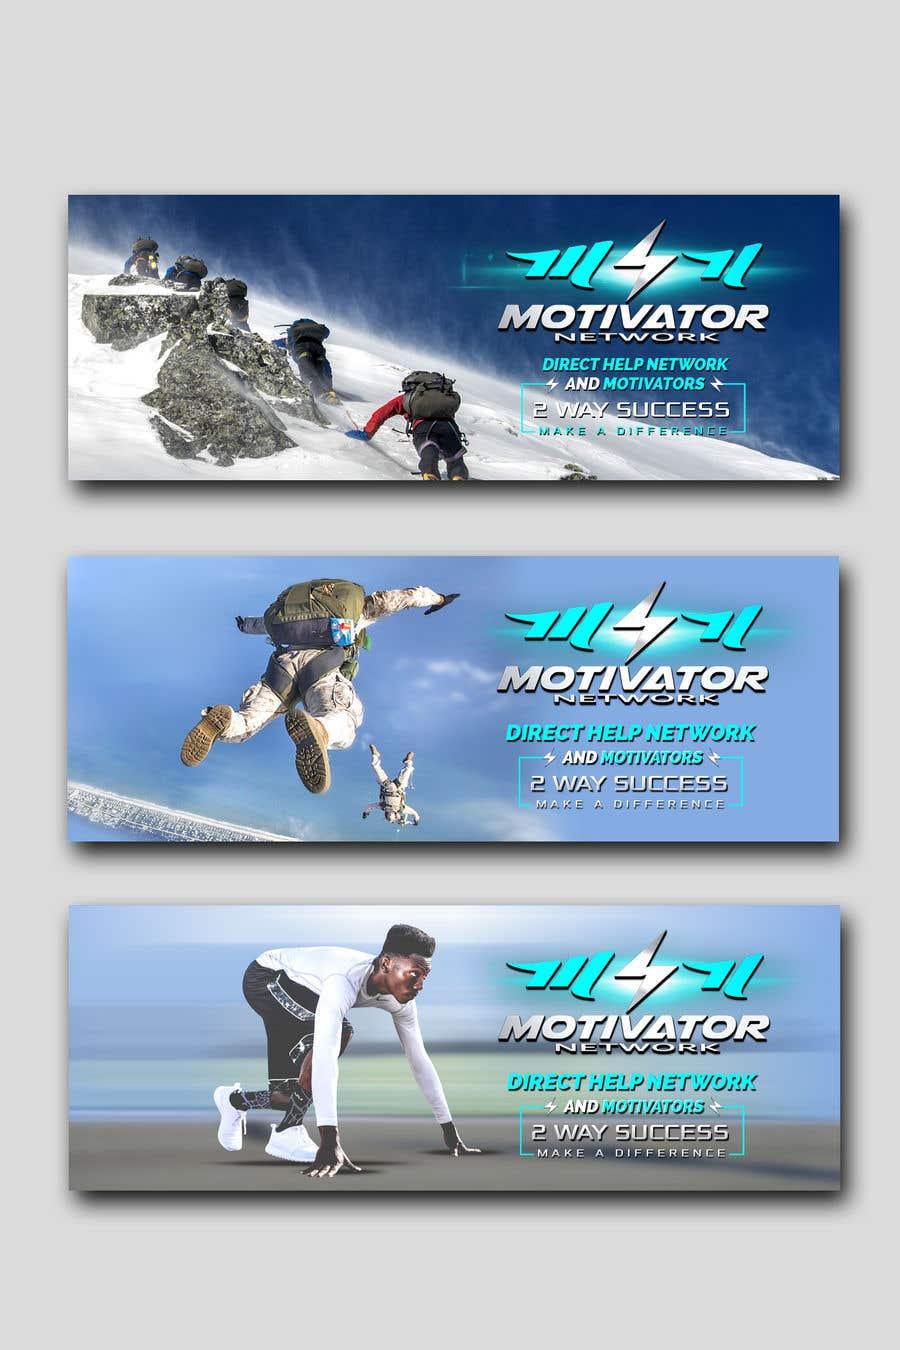 Kilpailutyö #70 kilpailussa Design a Banner - Motivator Network